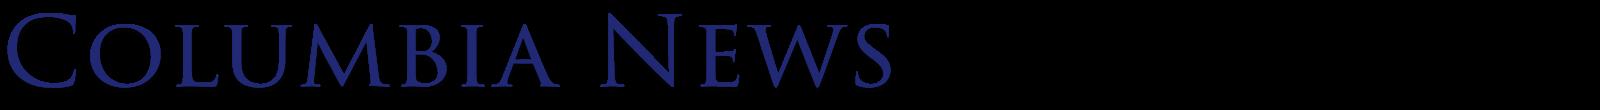 Columbia News logo